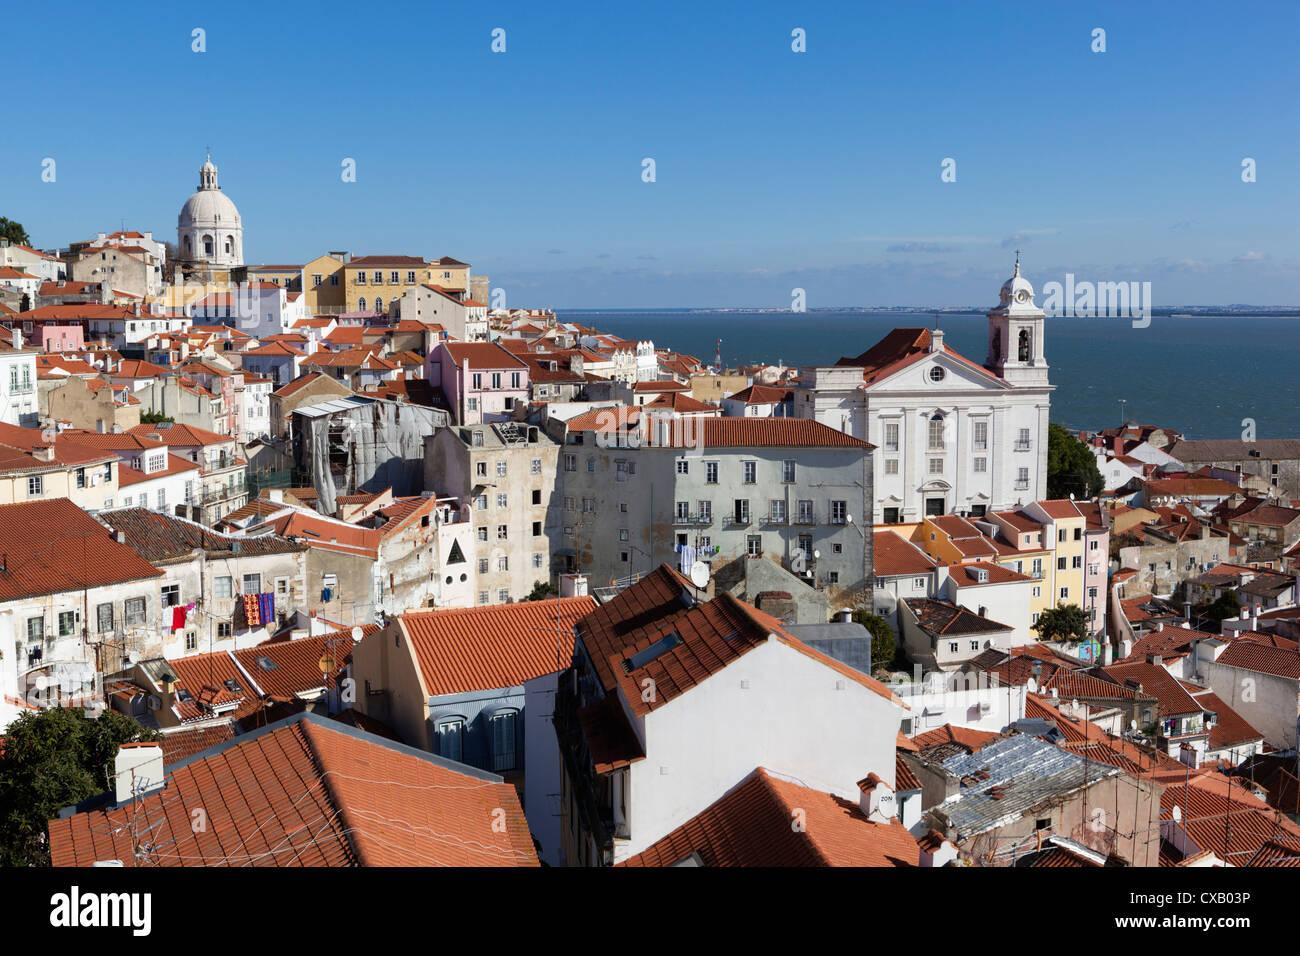 View over Alfama district from Miradouro das Portas do Sol, Alfama, Lisbon, Portugal, Europe - Stock Image